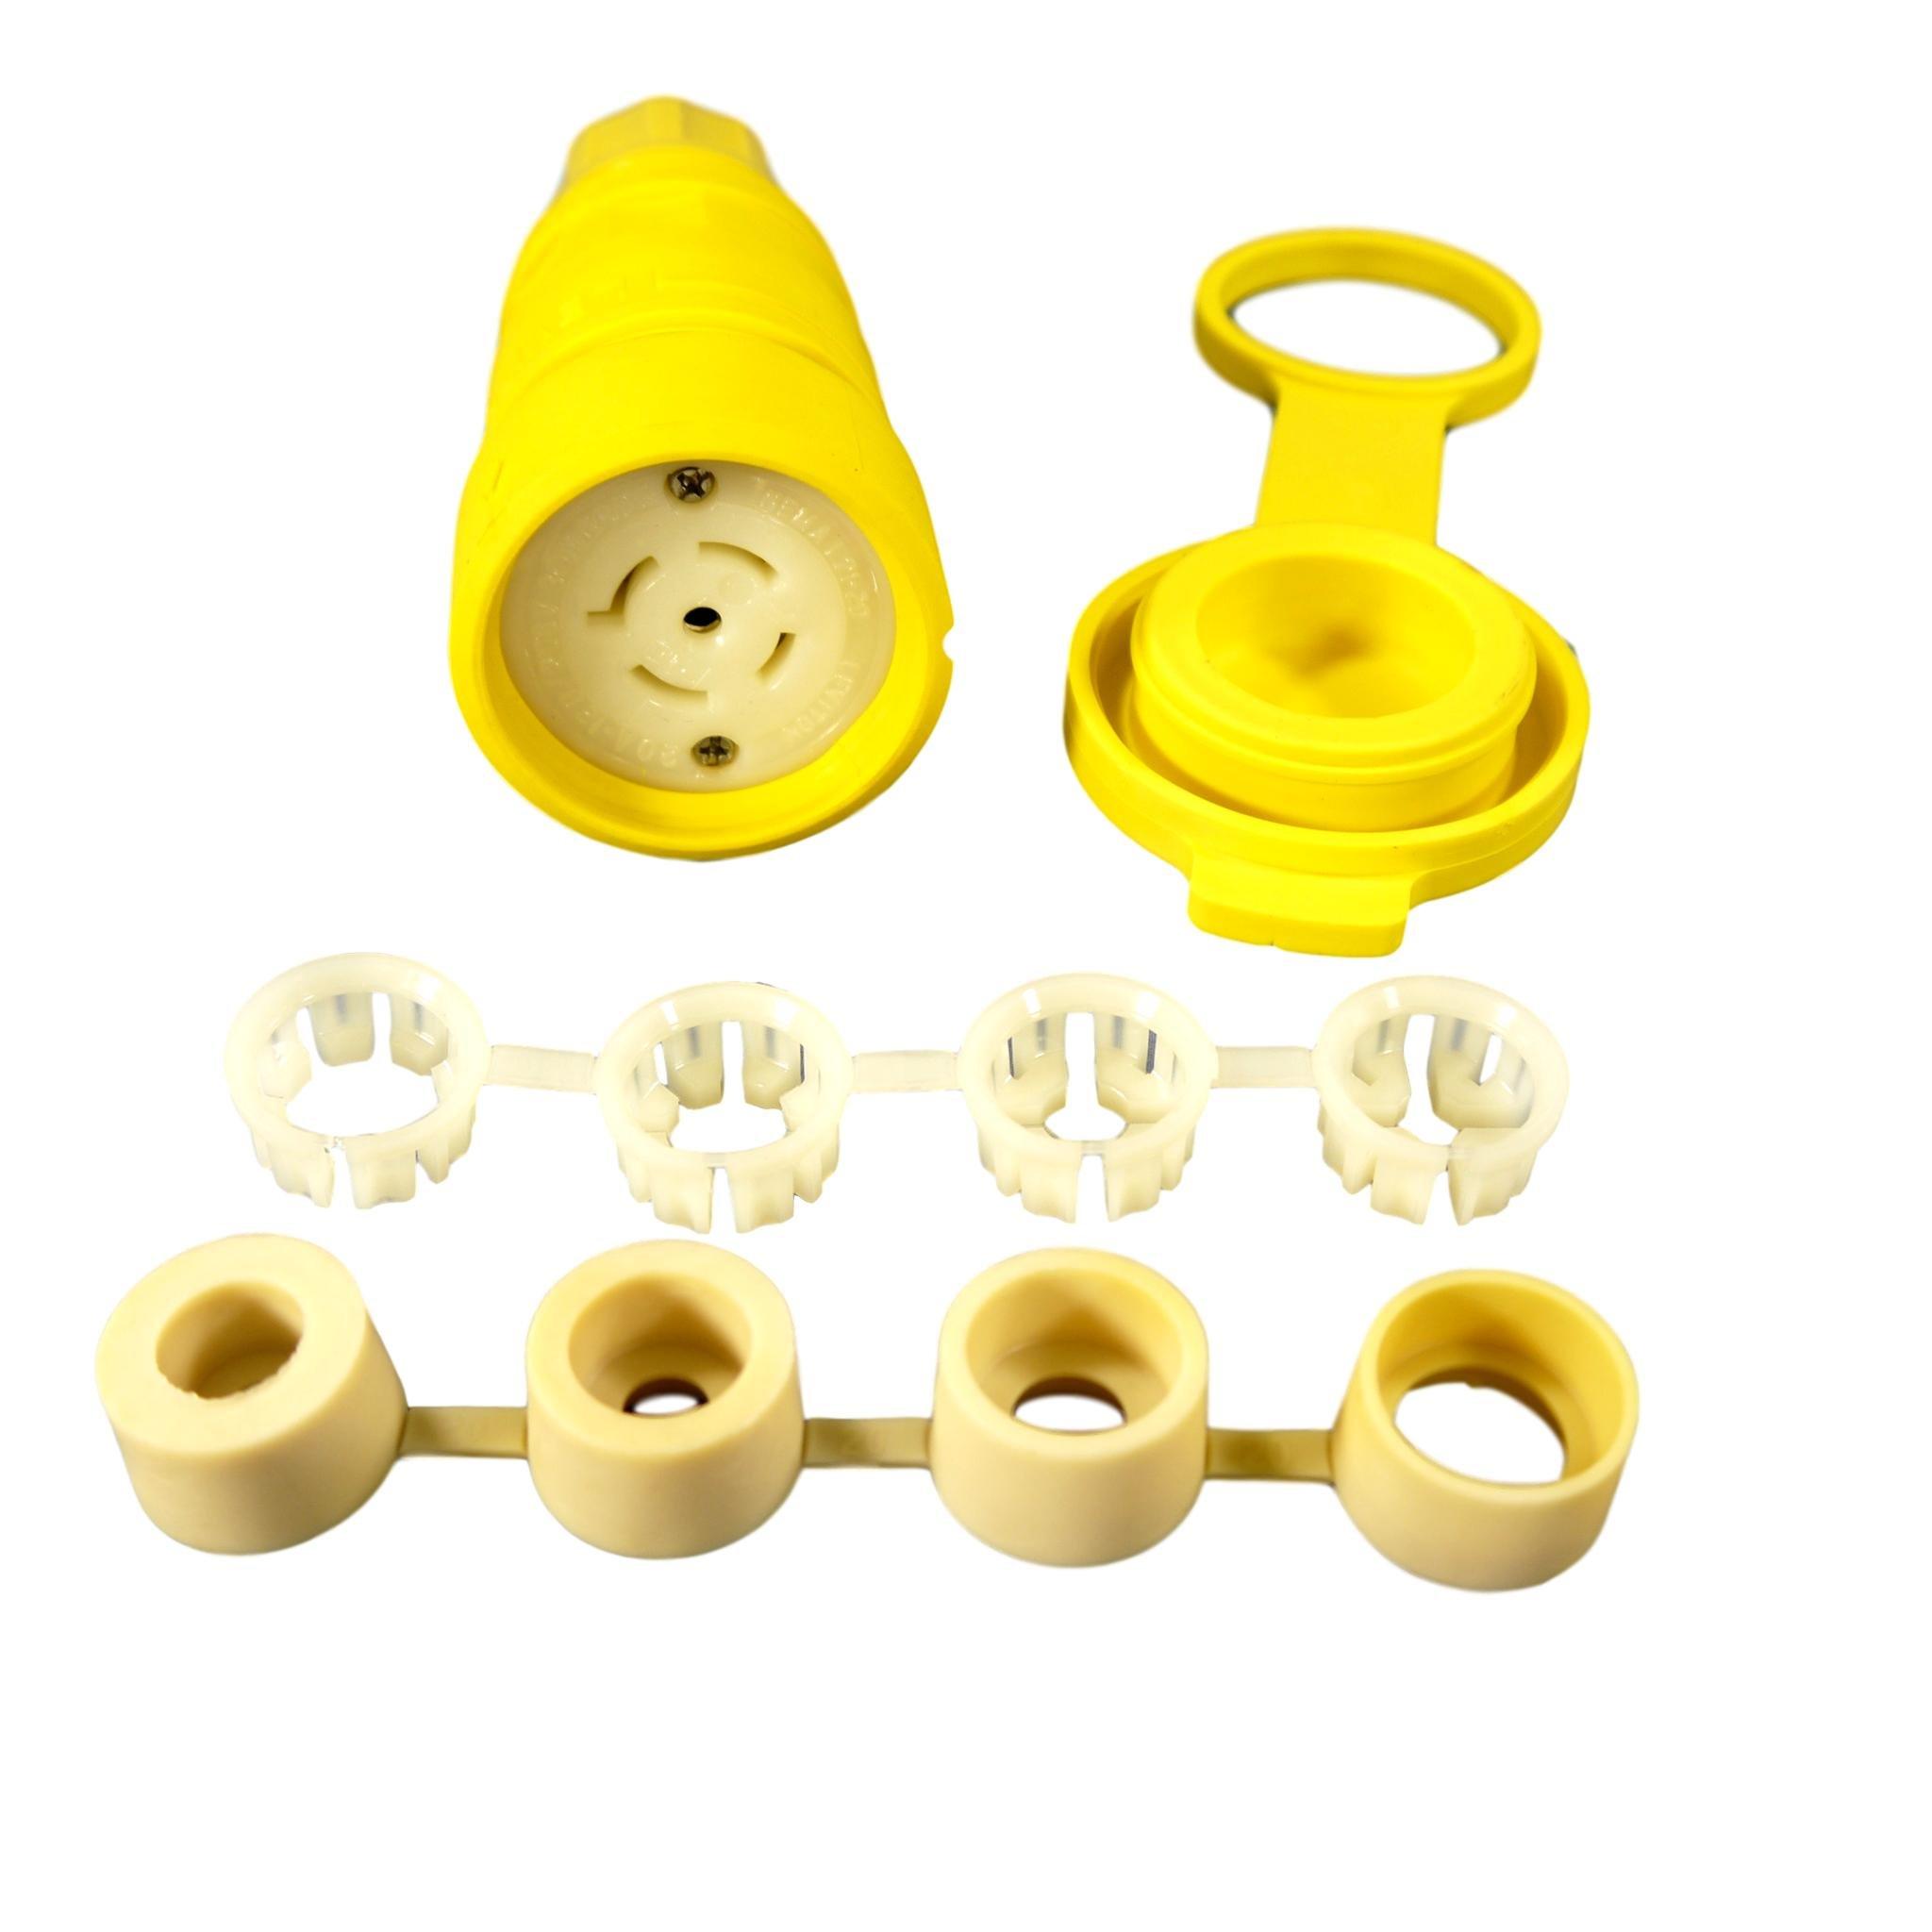 Leviton 27W81 20-Amp, 120/208-Volt 3PY, NEMA L21-20R, 4P, 5W, Locking Connector, Industrial Grade, Grounding, Wetguard, Yellow